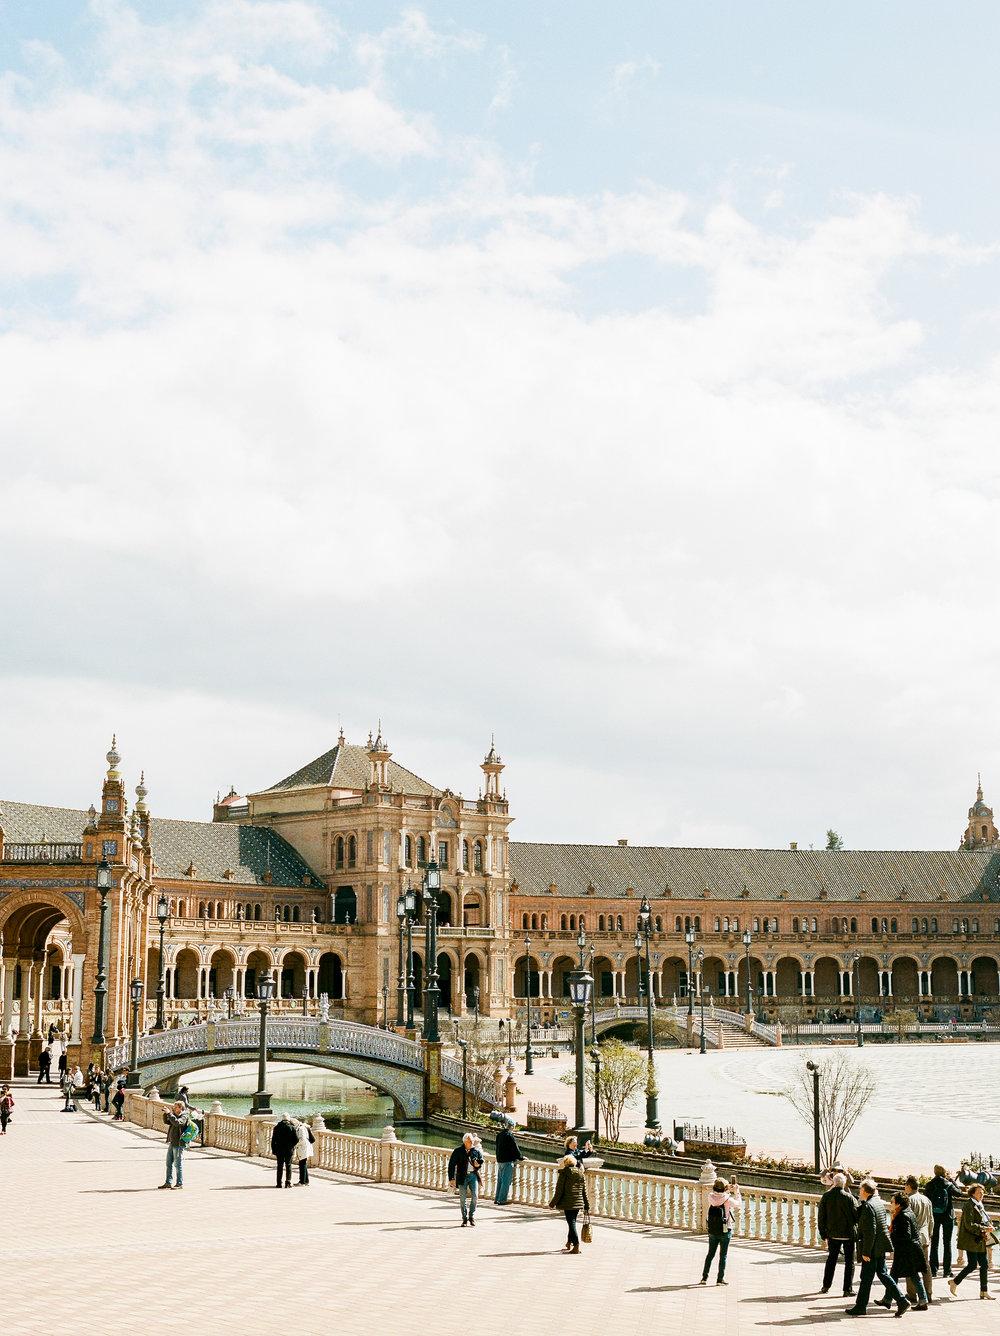 Plaza-de-espana-Seville-Spain-destination-photographer--144.jpg